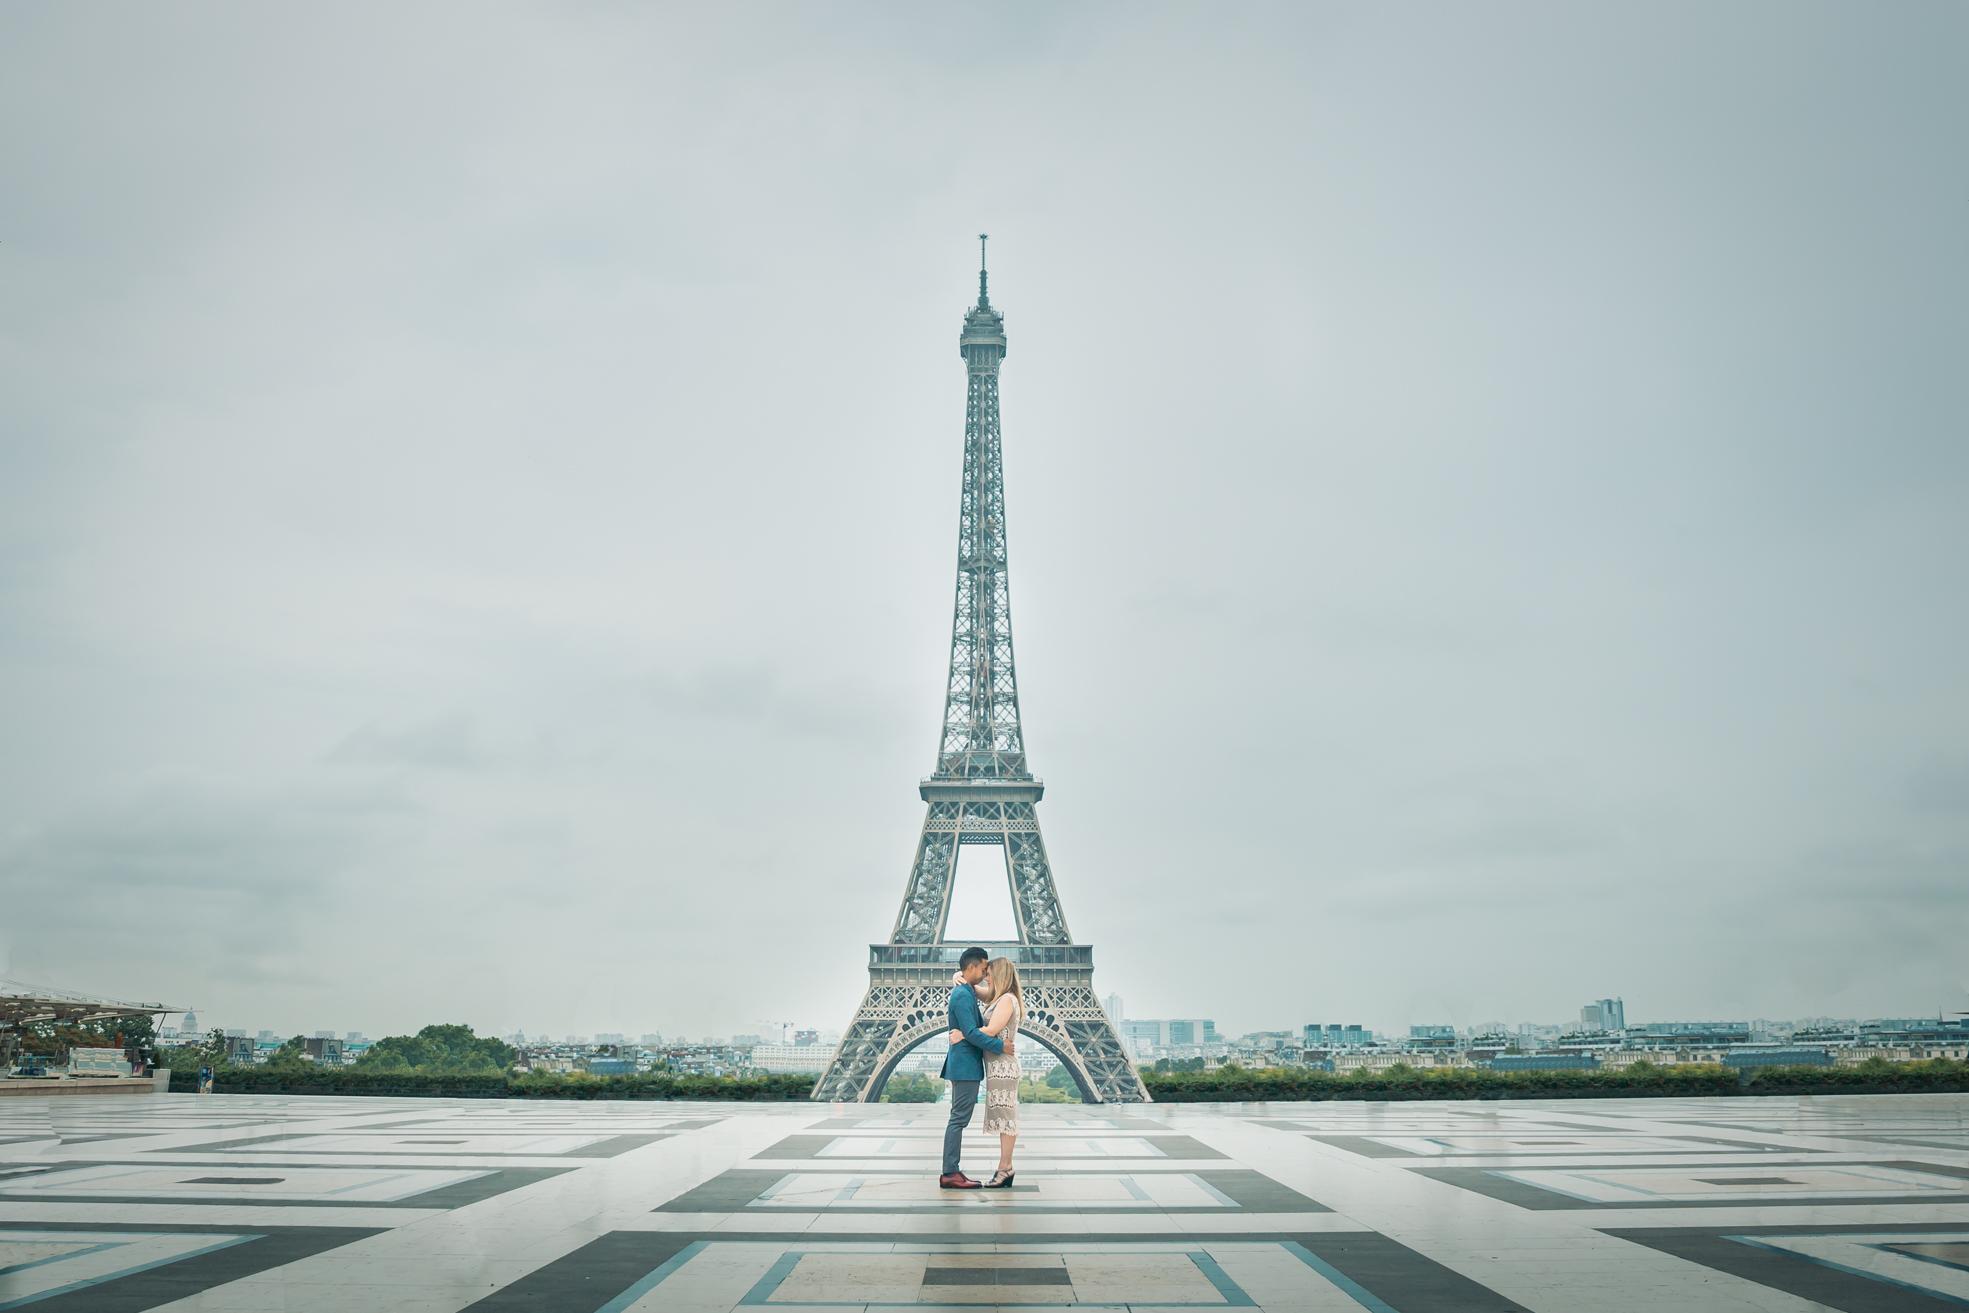 photographe mariage versailles, jean-Baptiste Chauvin, www.studioart-photographe.fr